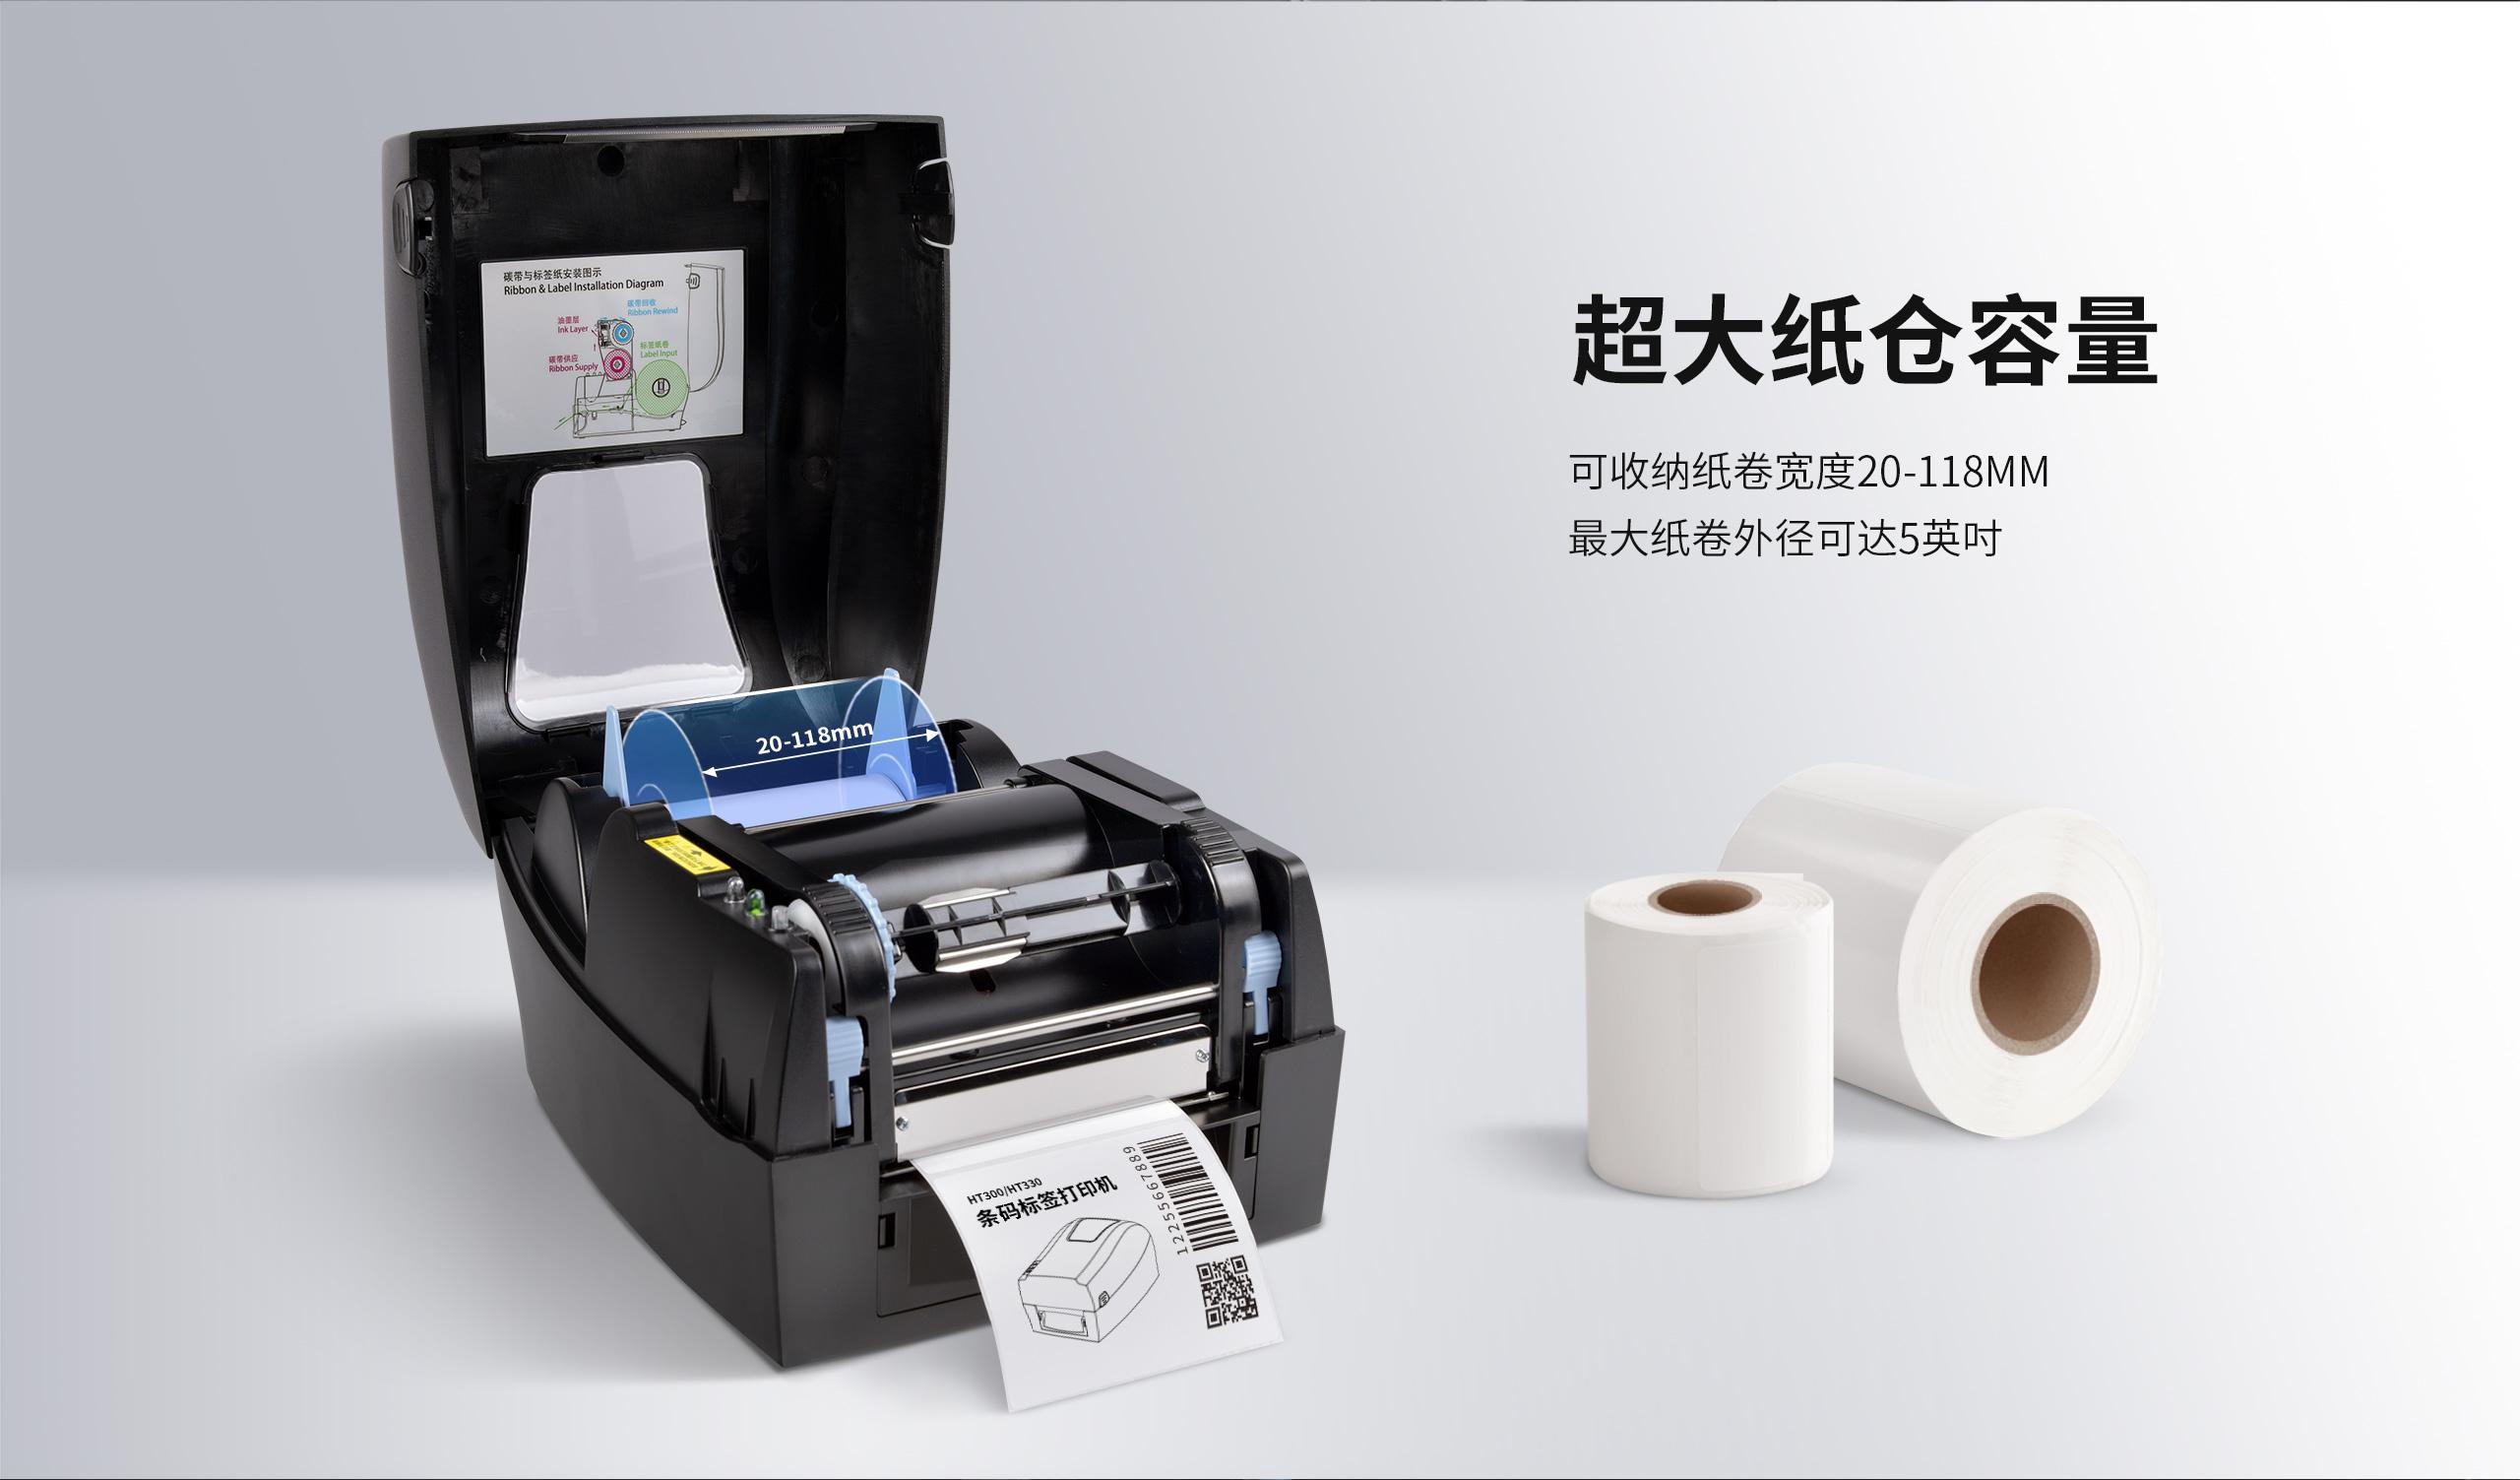 HT300/HT330条码打印机  第4张